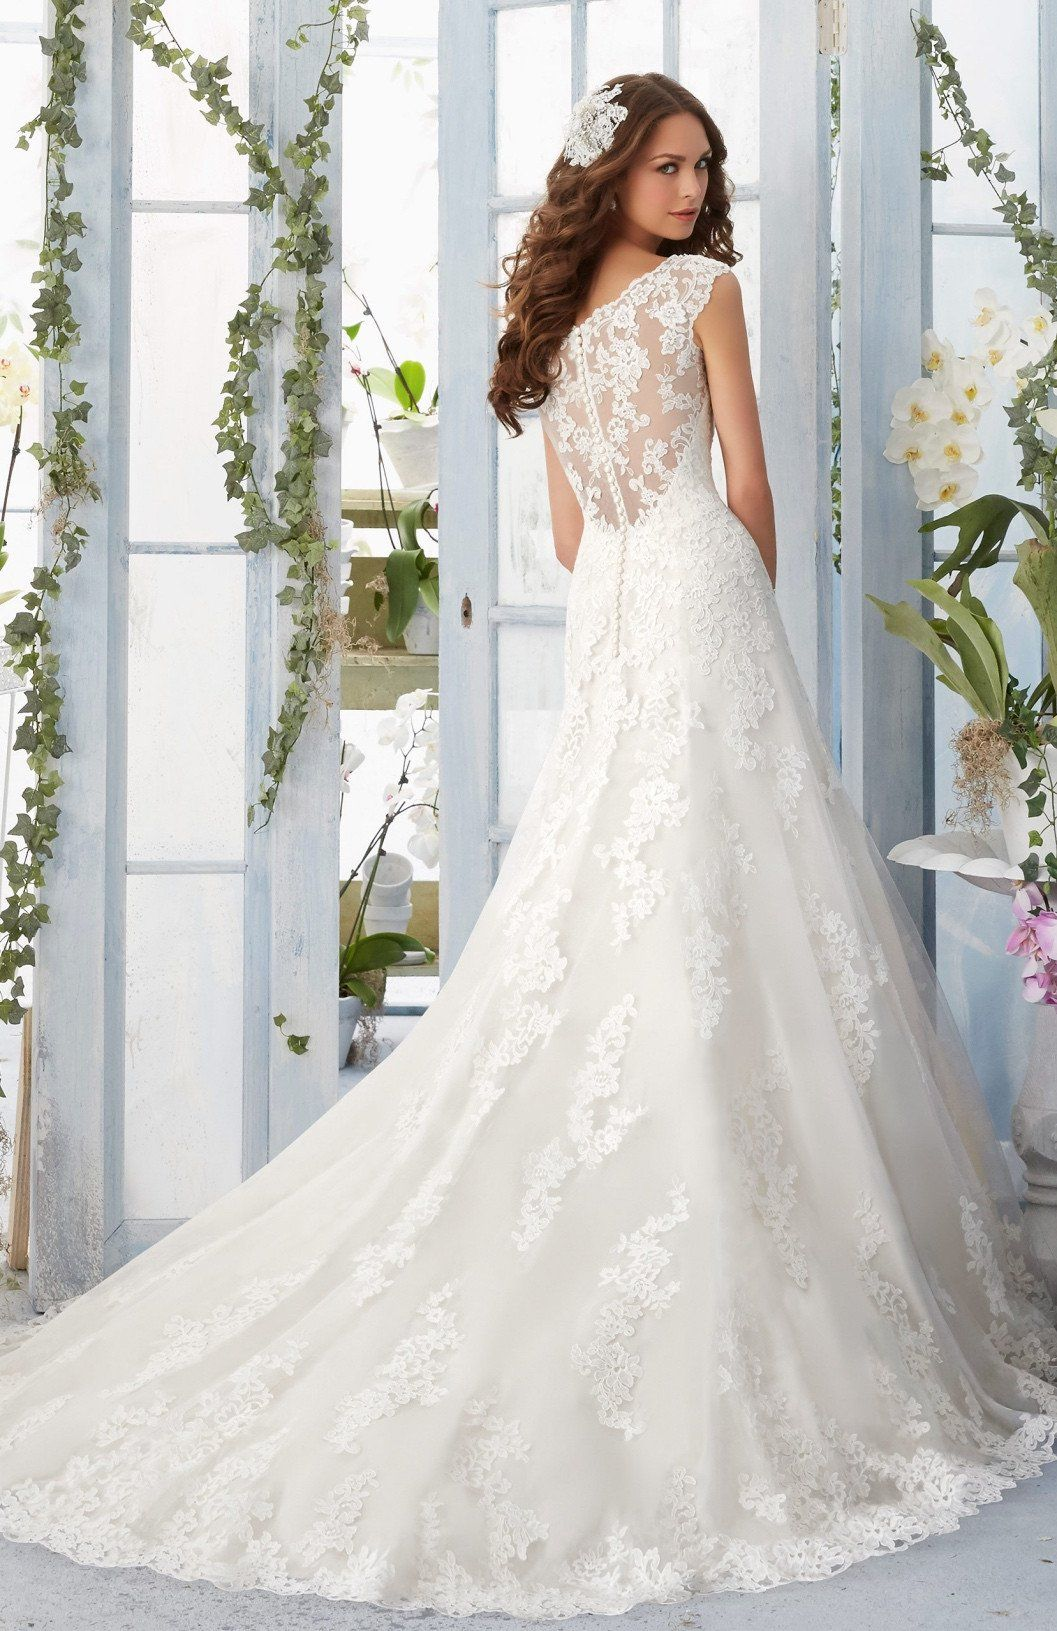 AGUSTA 2018 brudekjole fra Panayotis   Kjole bryllup